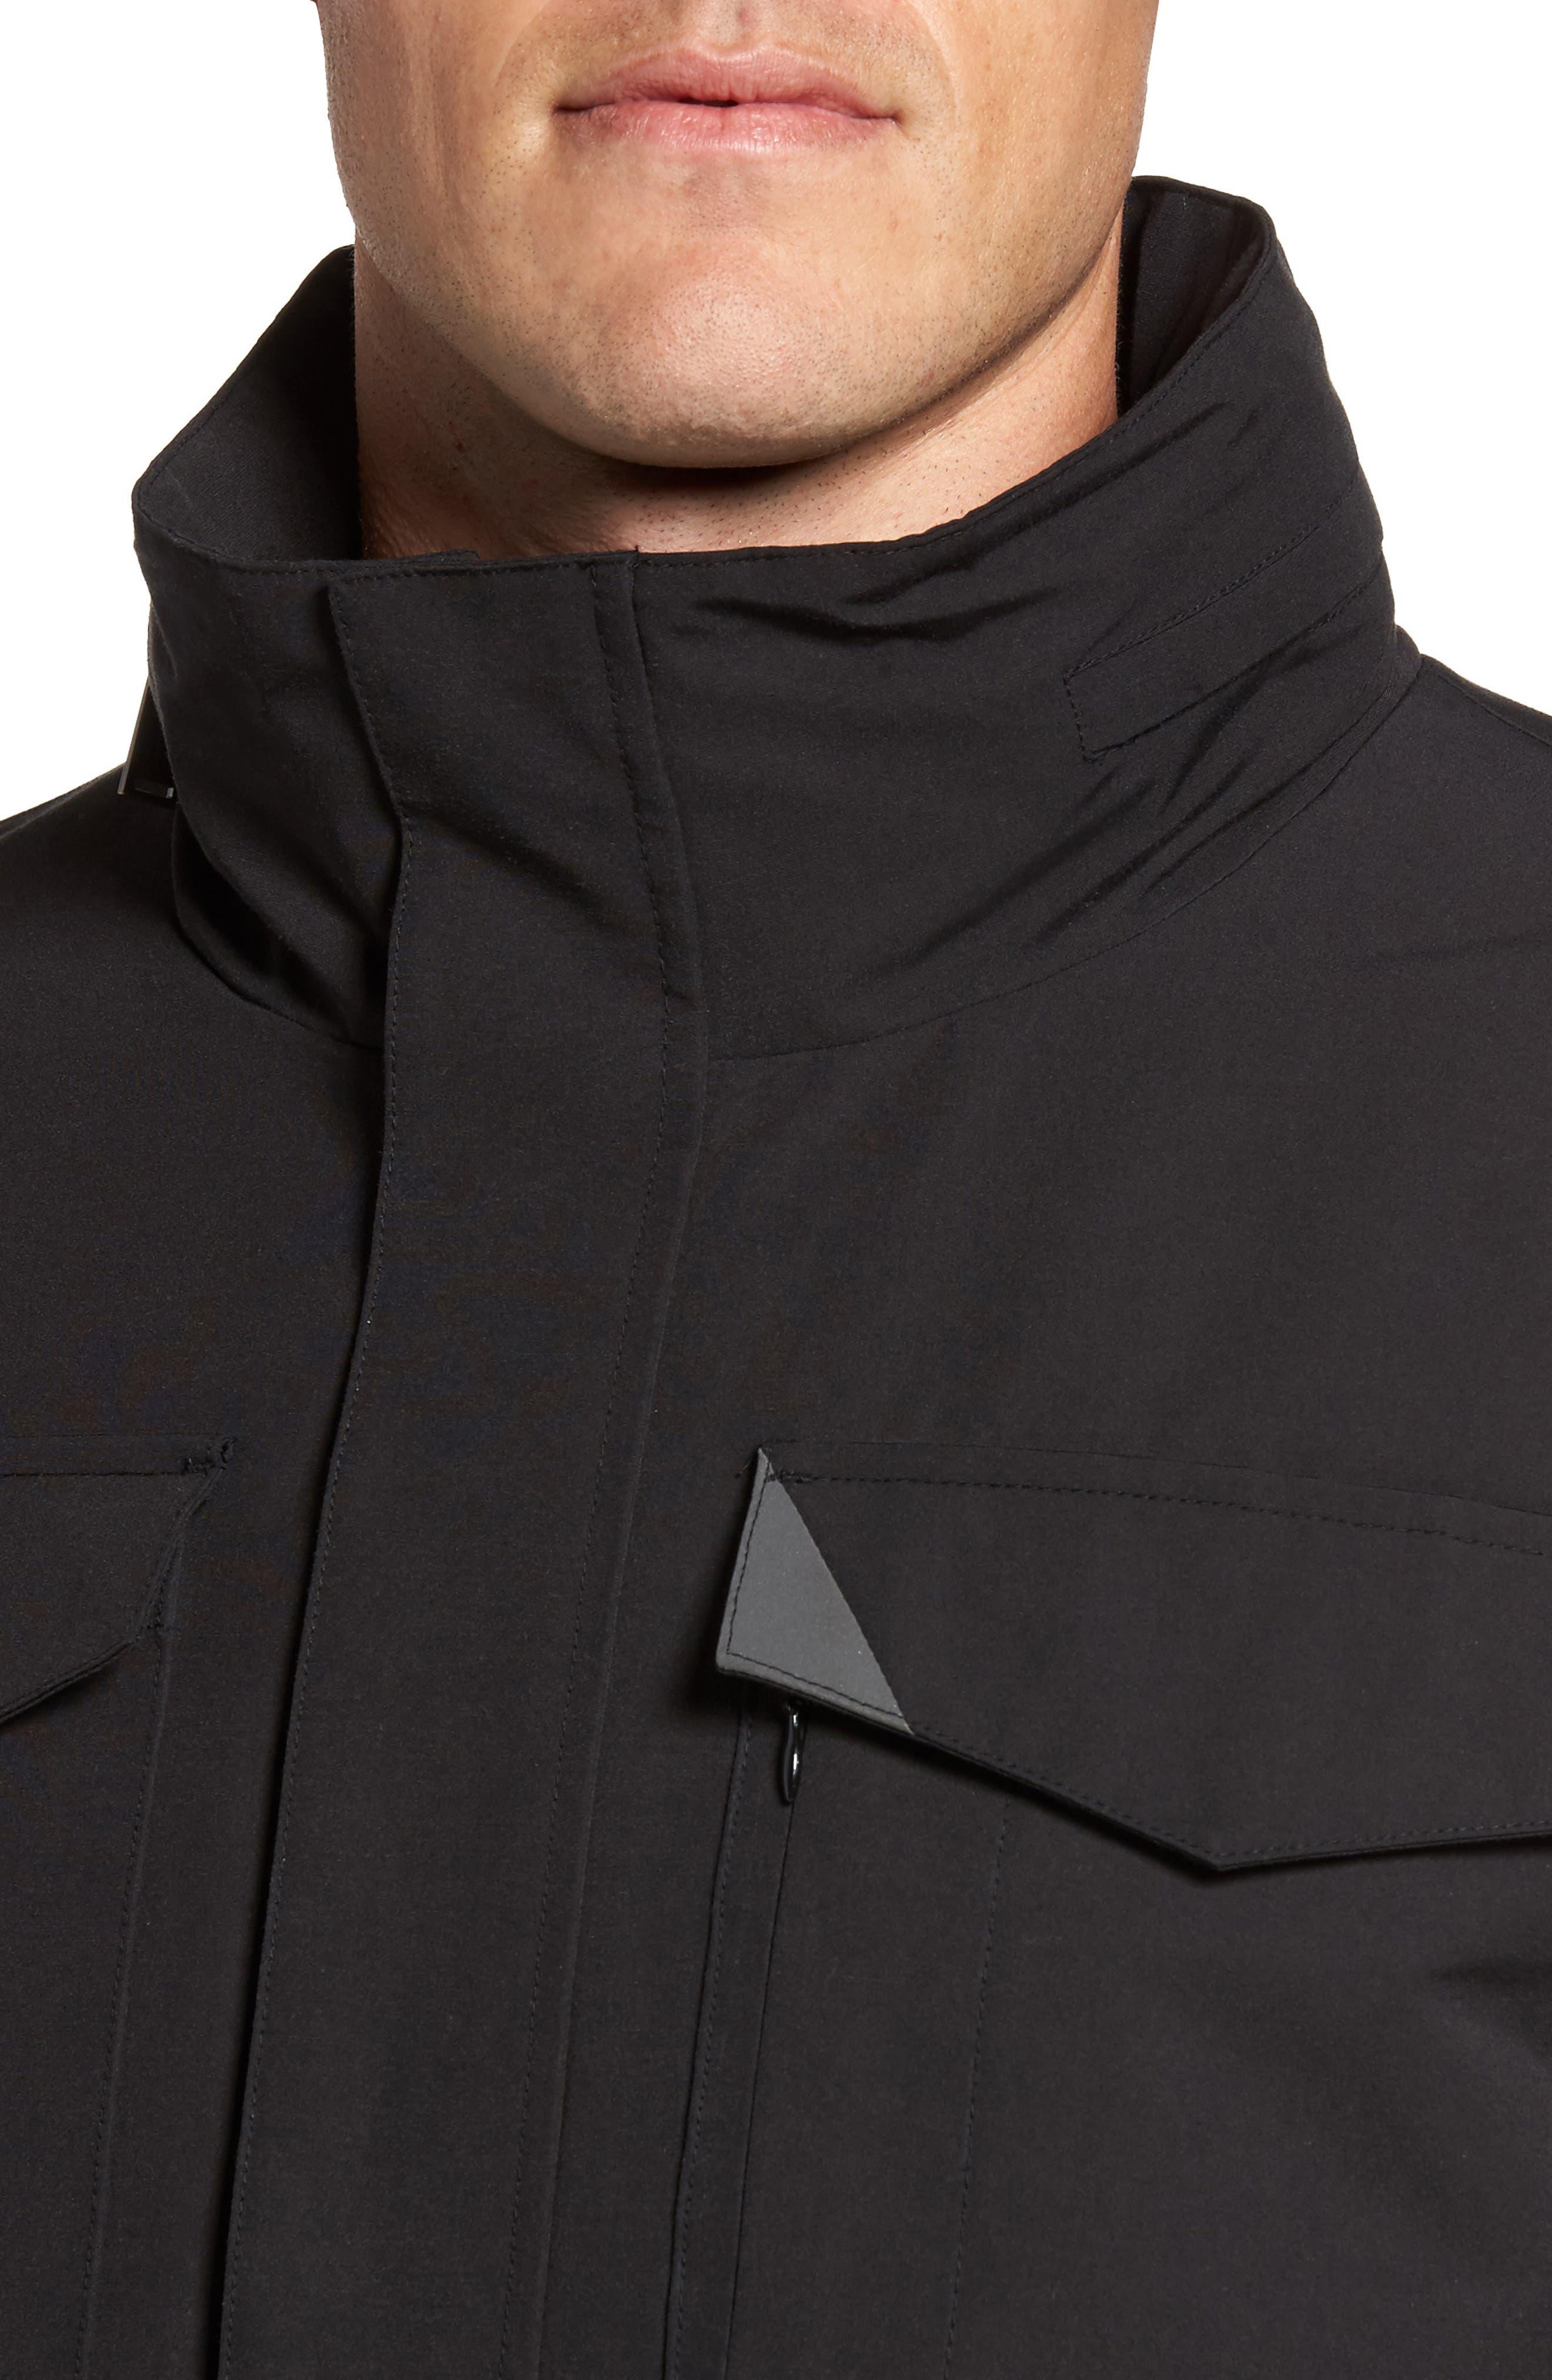 Clyde Hill Waterproof Field Jacket,                             Alternate thumbnail 4, color,                             Black